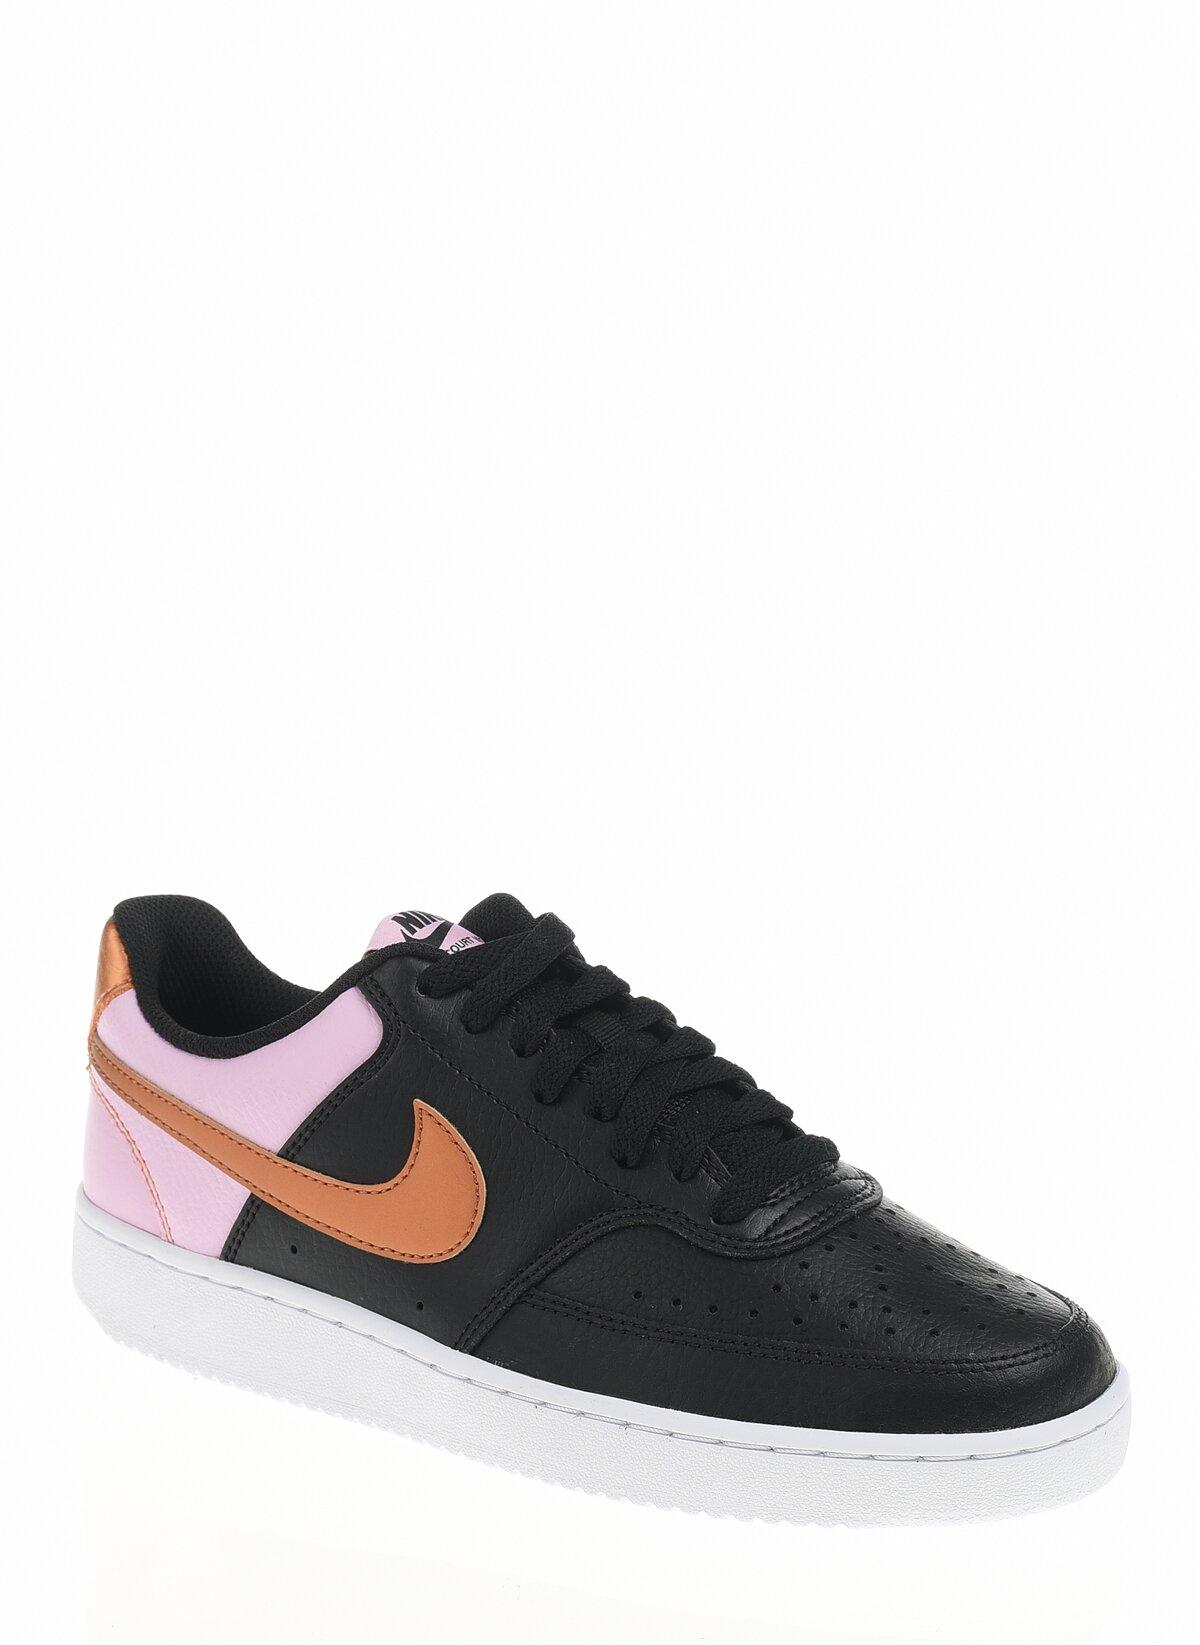 Court Vision Low Kadın Siyah Spor Ayakkabı (CD5434-004)